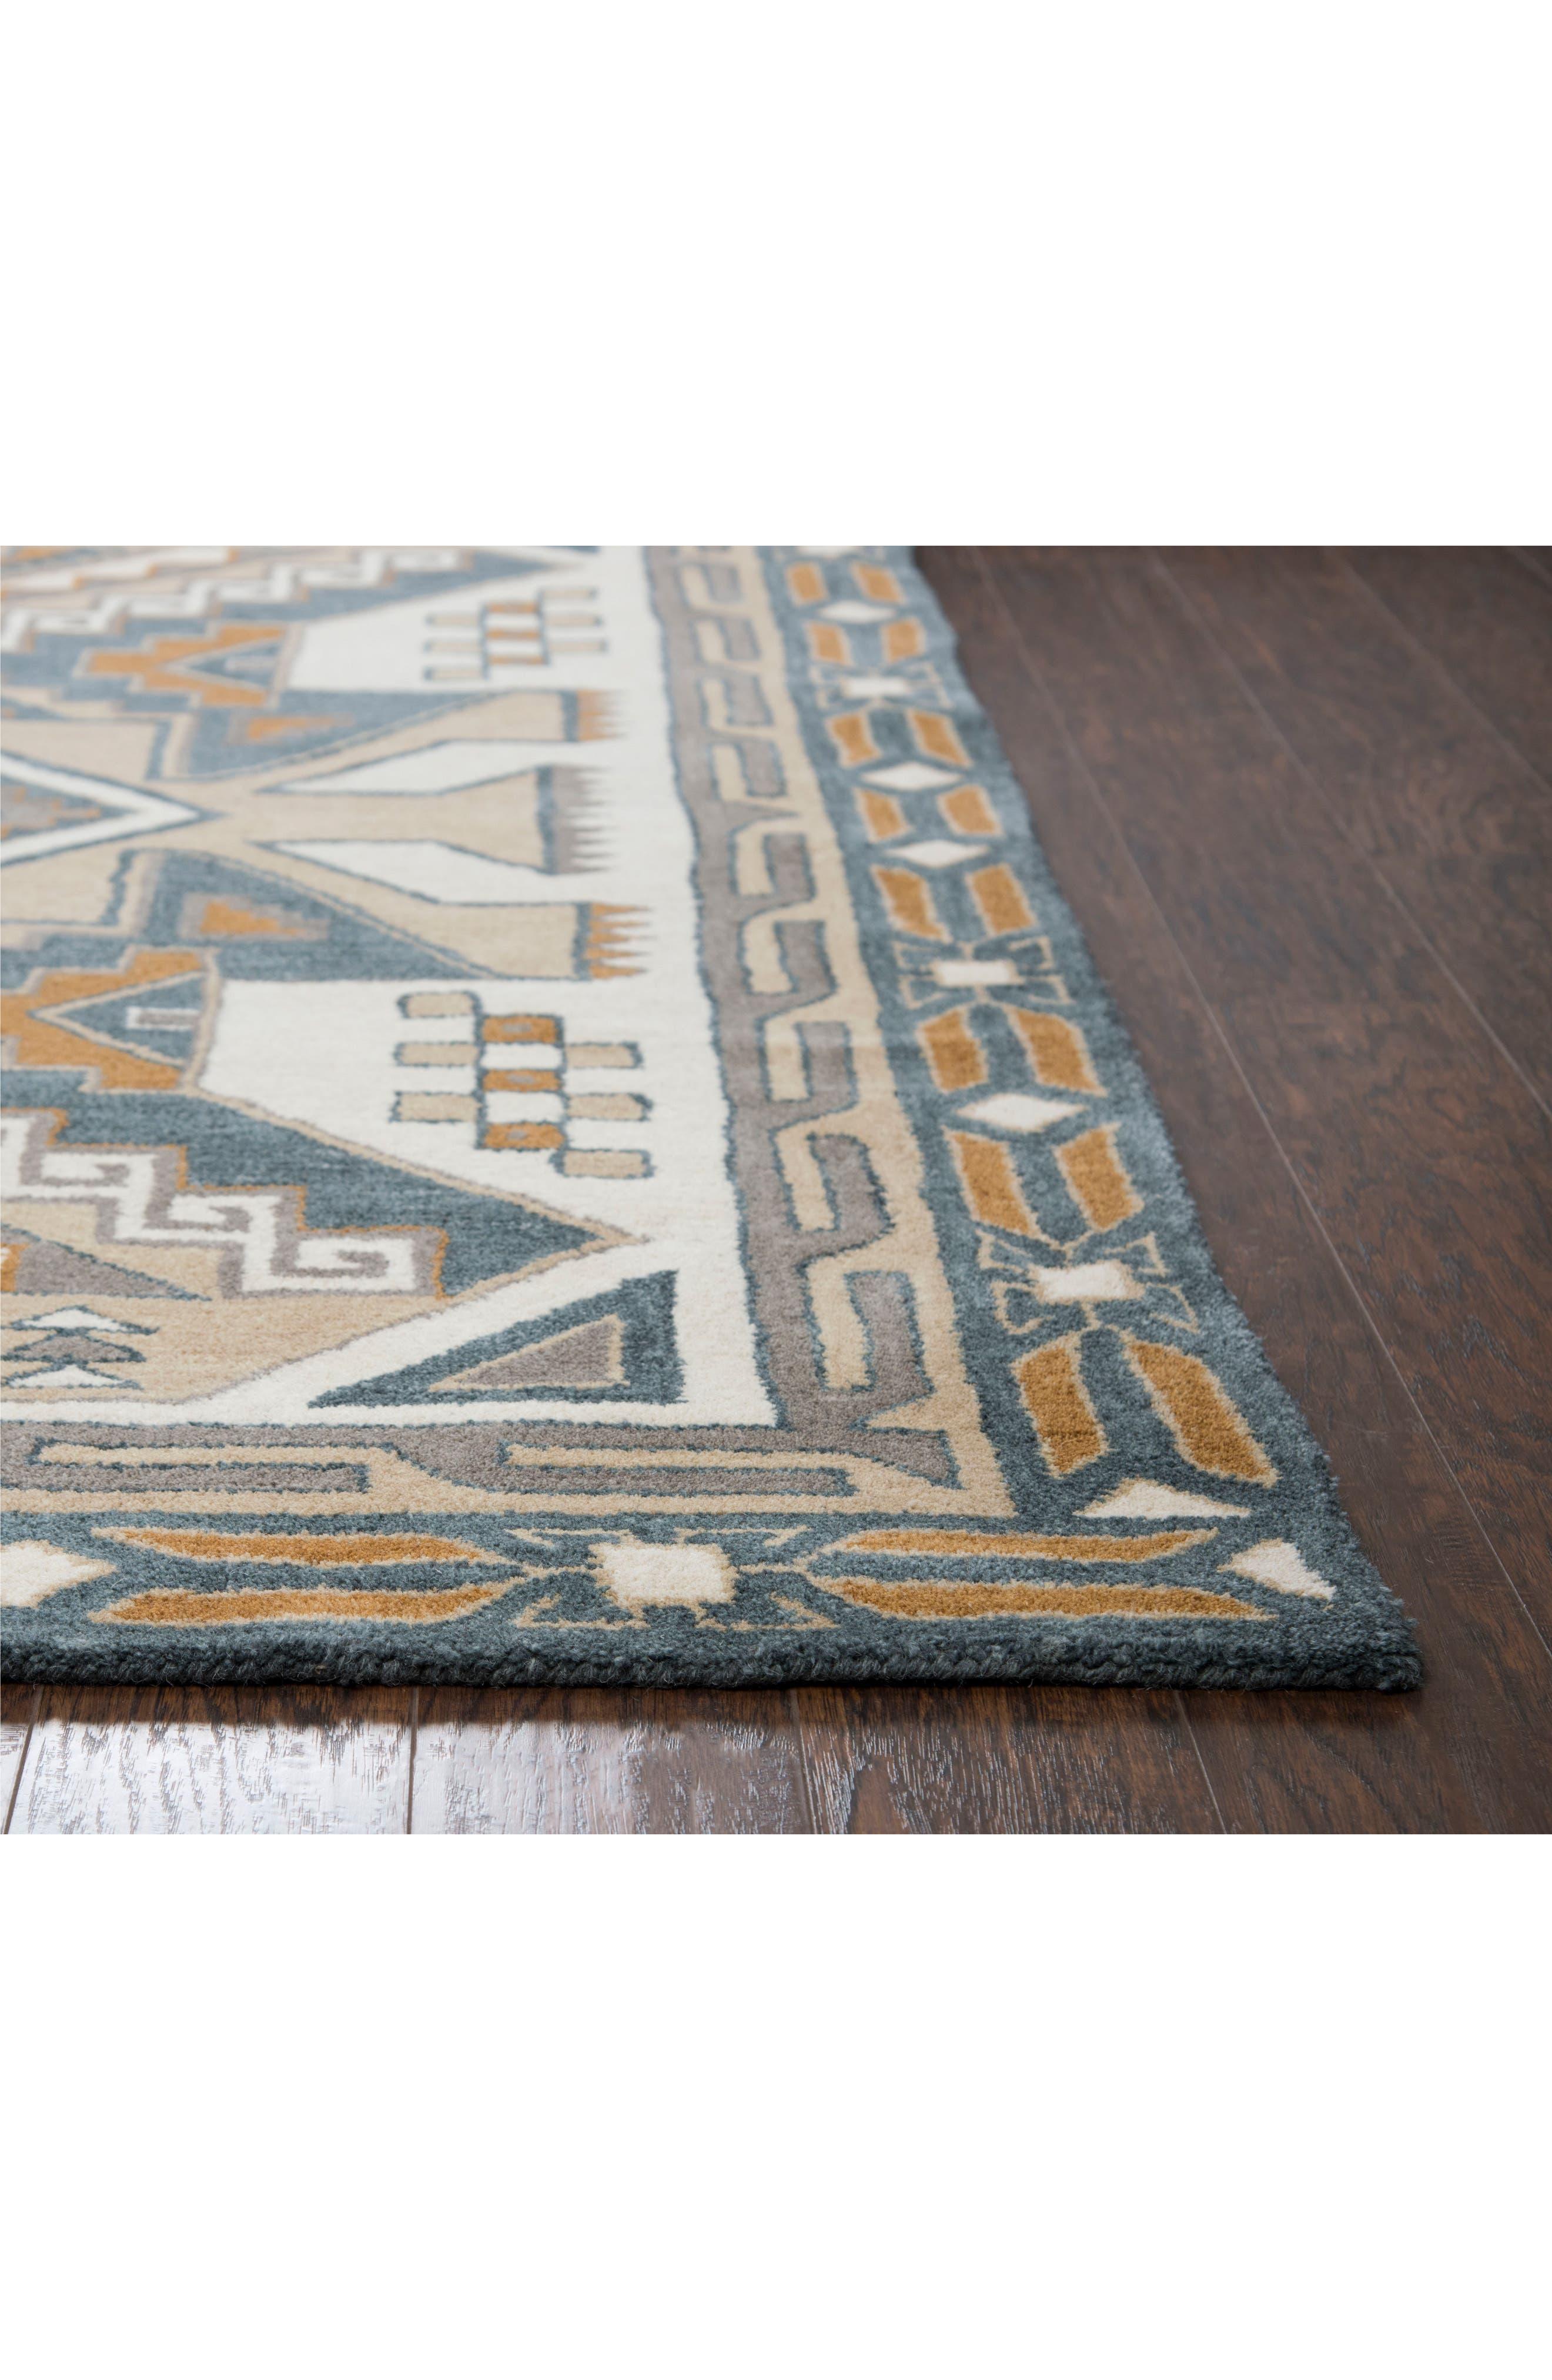 Urban Tiles Hand Tufted Wool Rug,                             Alternate thumbnail 3, color,                             220